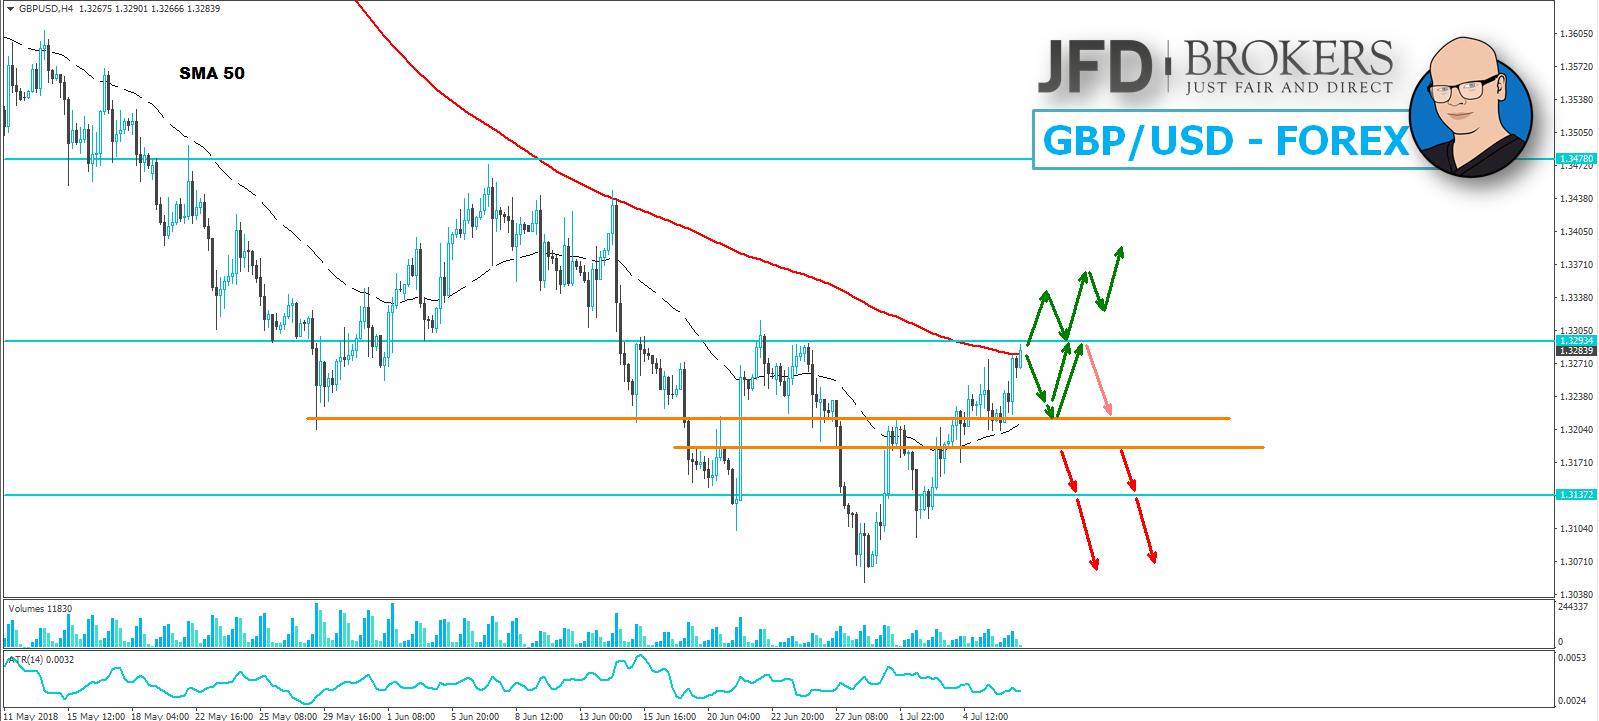 JFD-Wochenausblick-EUR-USD-GBP-USD-DAX-und-WTI-09-07-2018-13-07-2018-Kommentar-JFD-Brokers-GodmodeTrader.de-2